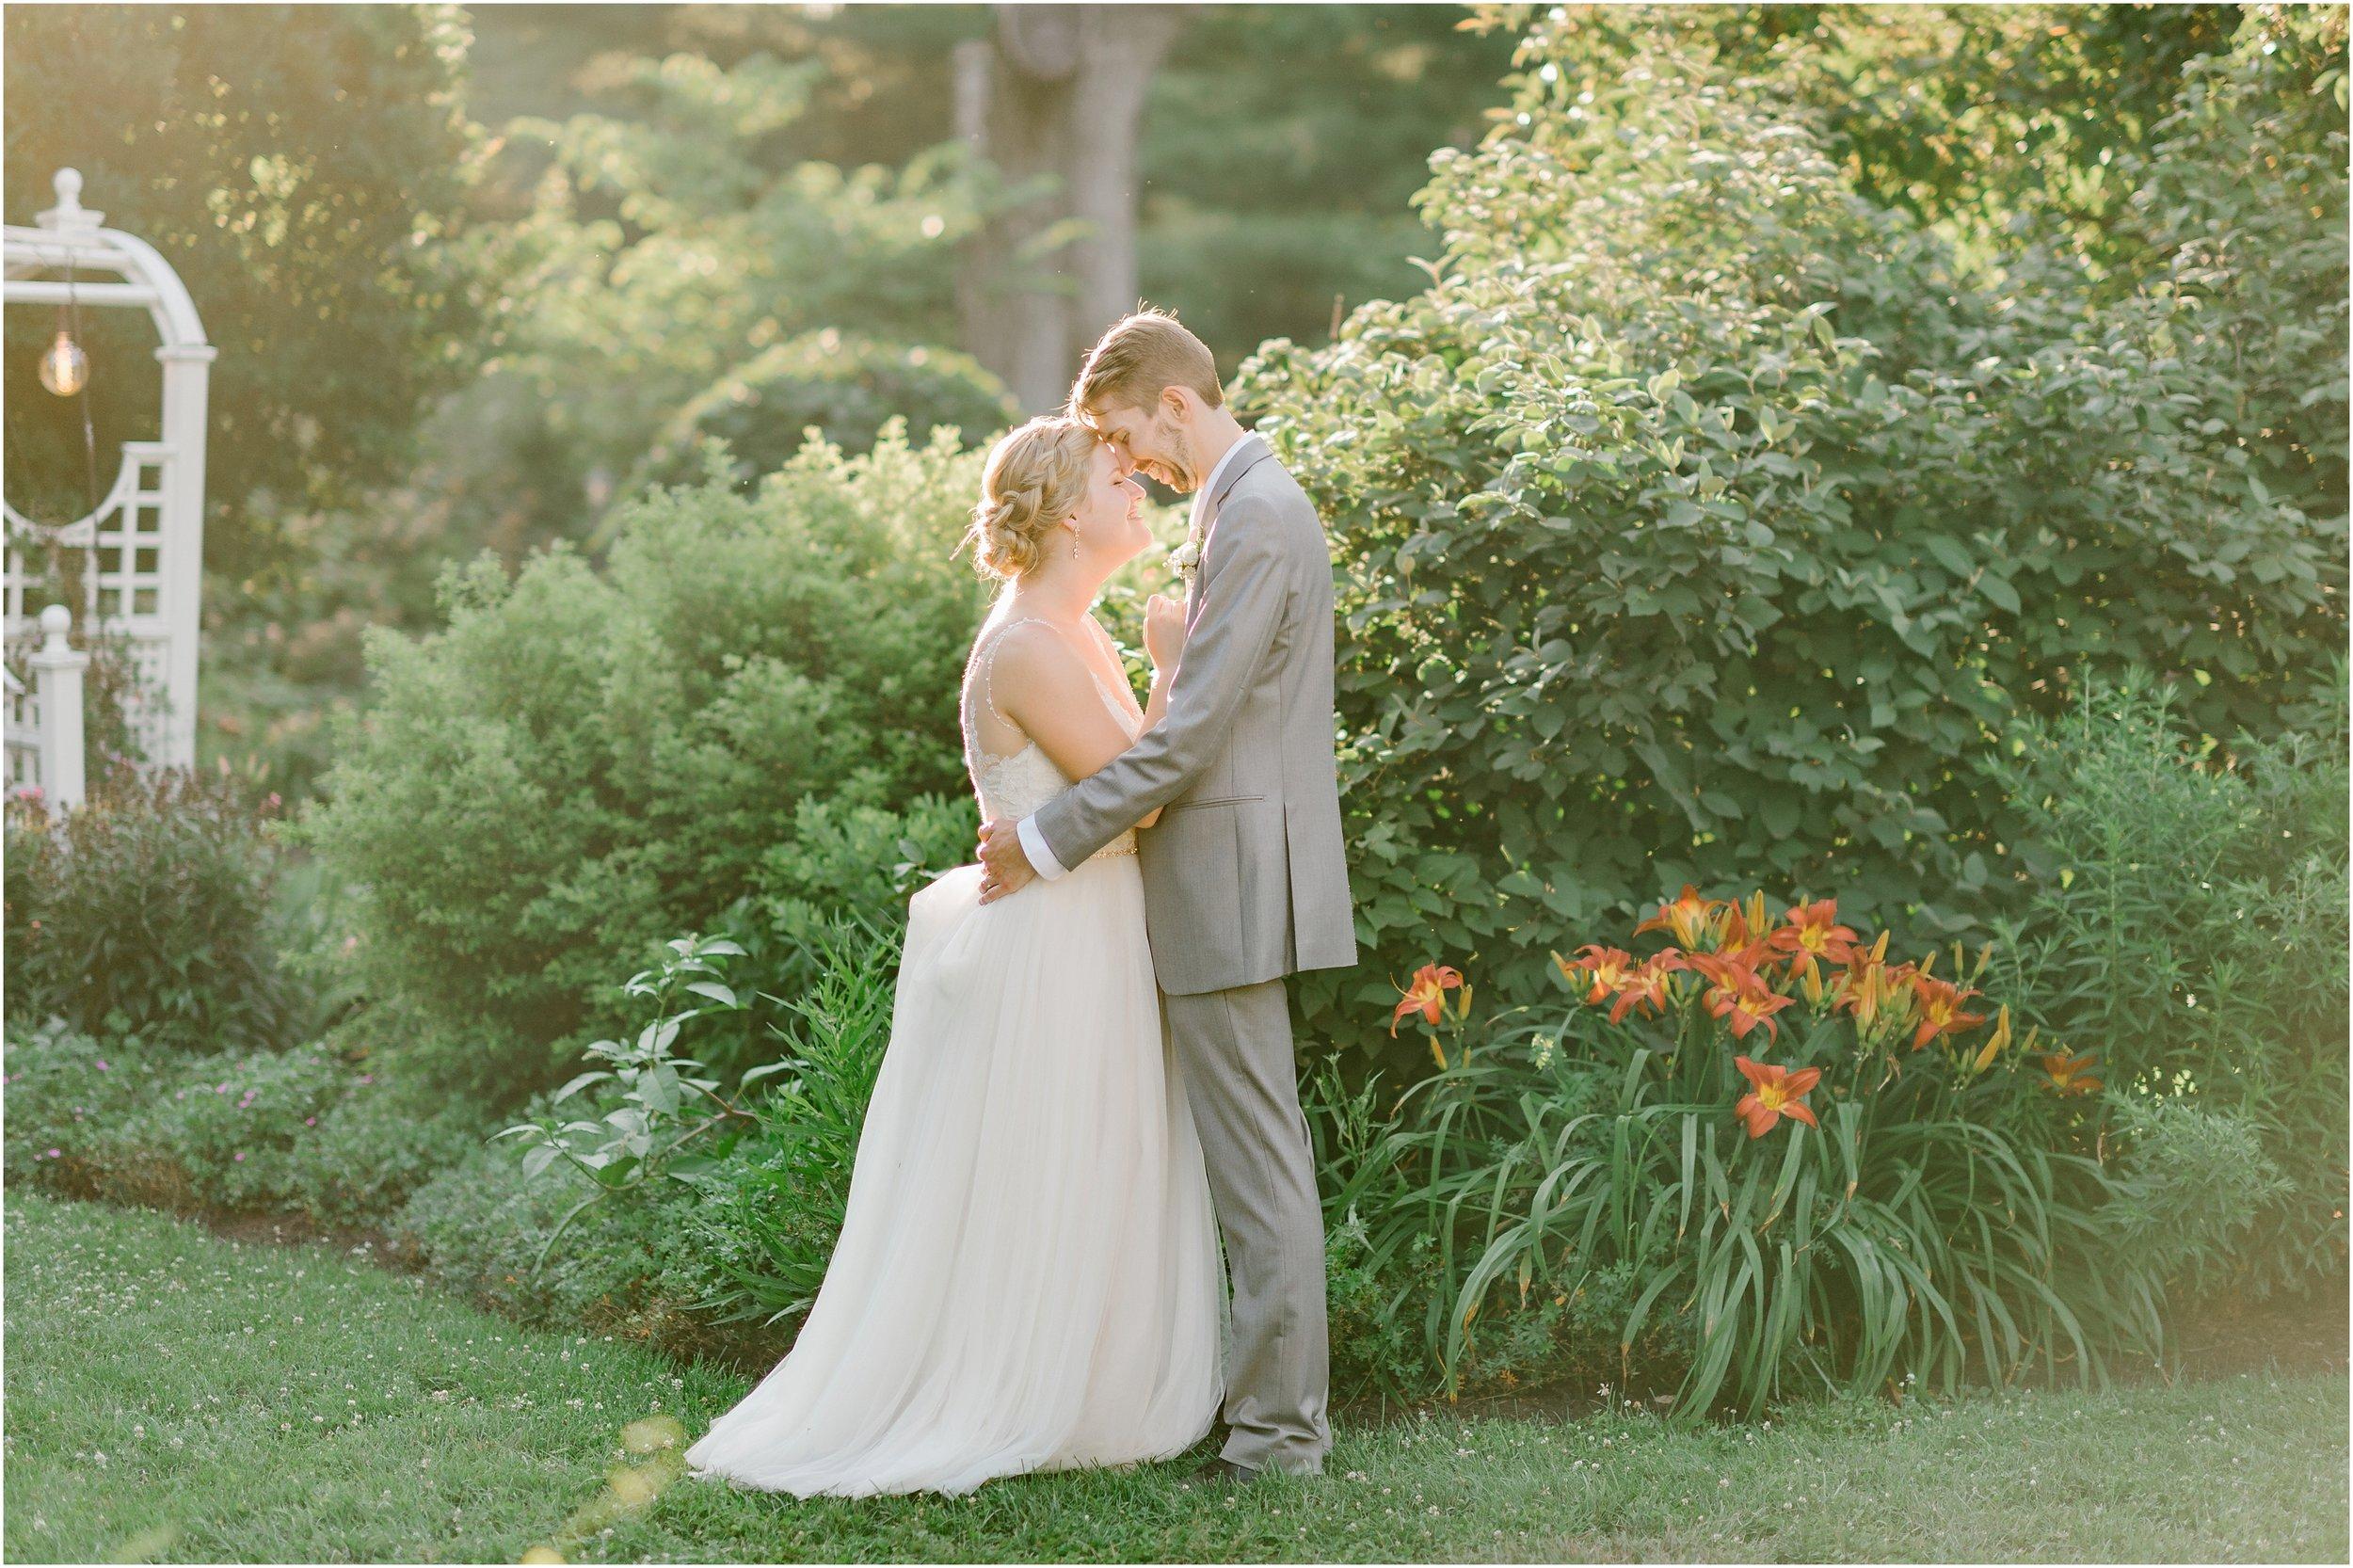 Rebecca_Shehorn_Photography_Indianapolis_Wedding_Photographer_8520.jpg